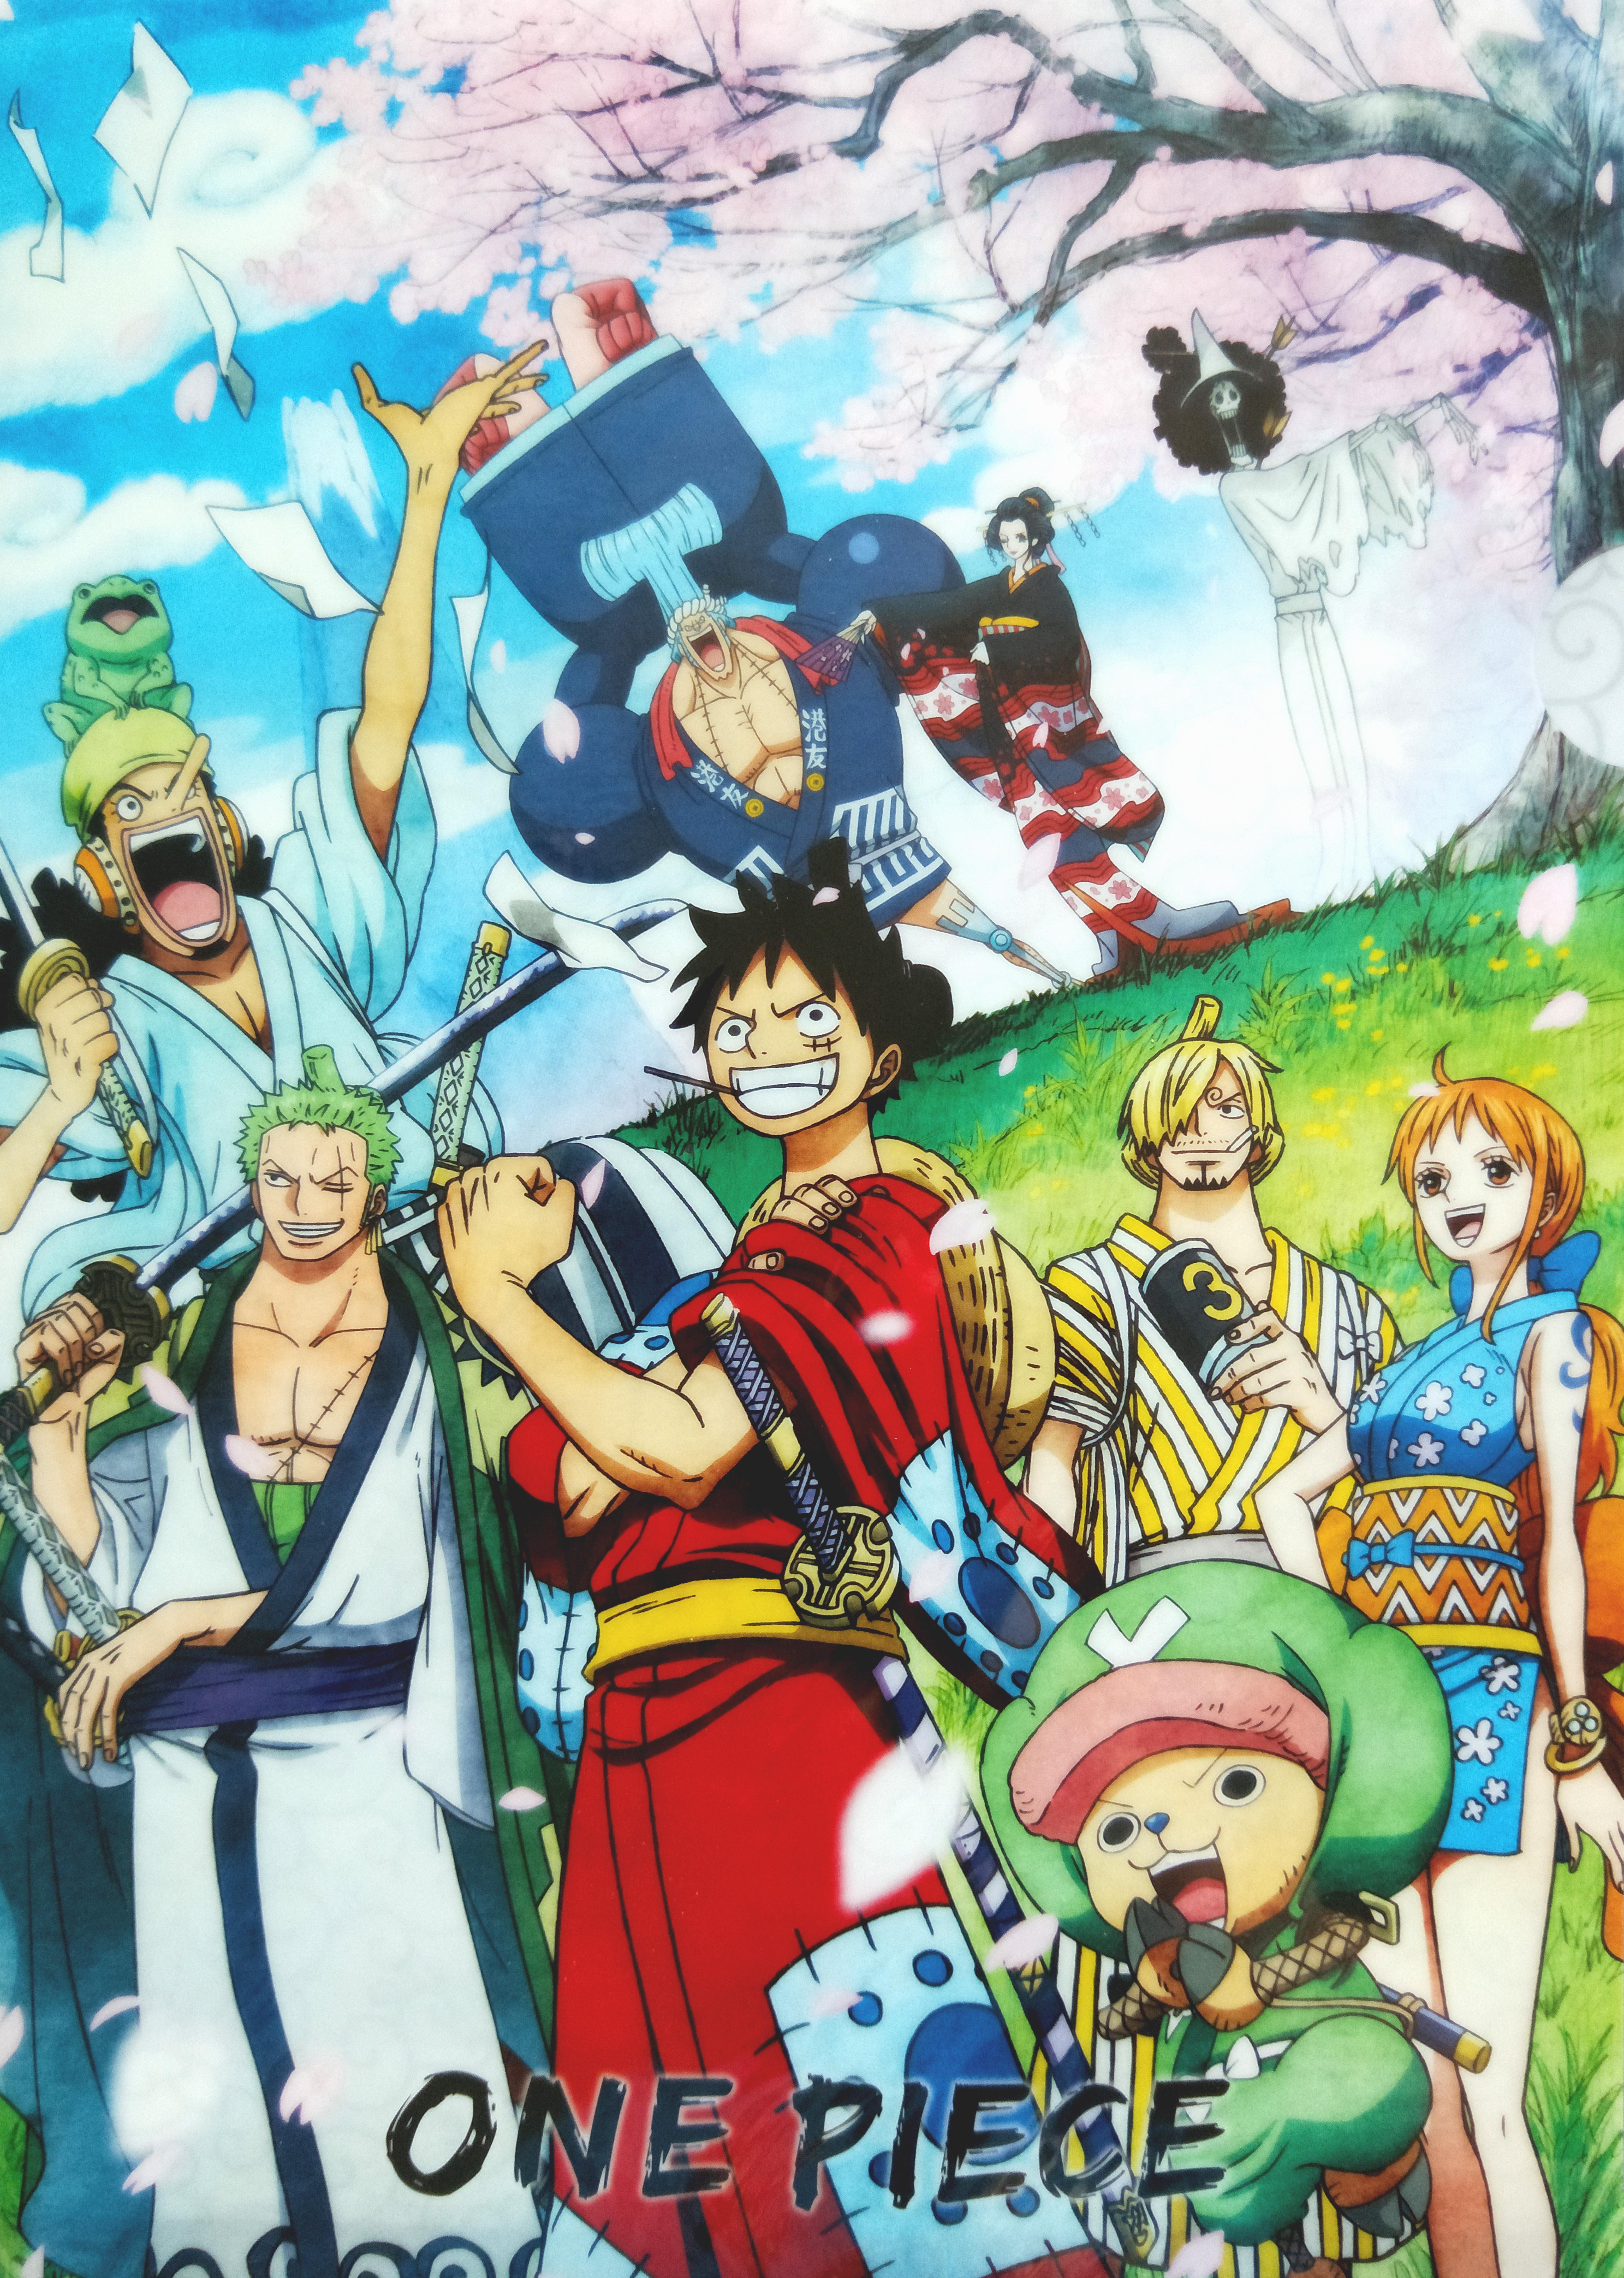 One Piece Wano Kuni Wallpapers Wallpaper Cave